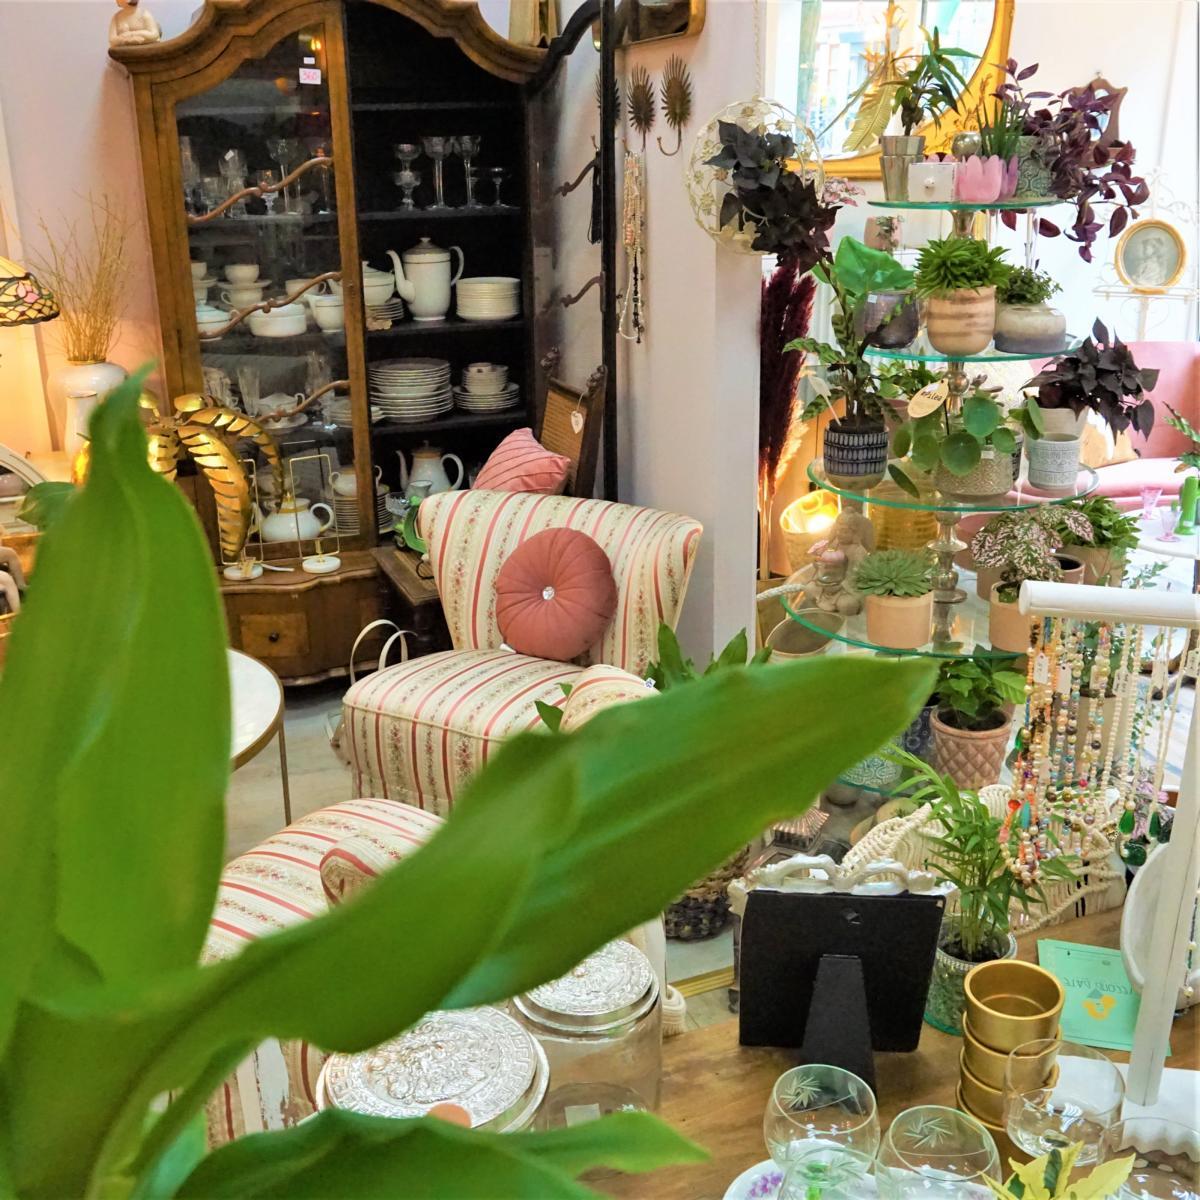 Style Hannover Second Date 3 - Second Date: Pflanzen & Antiquitäten